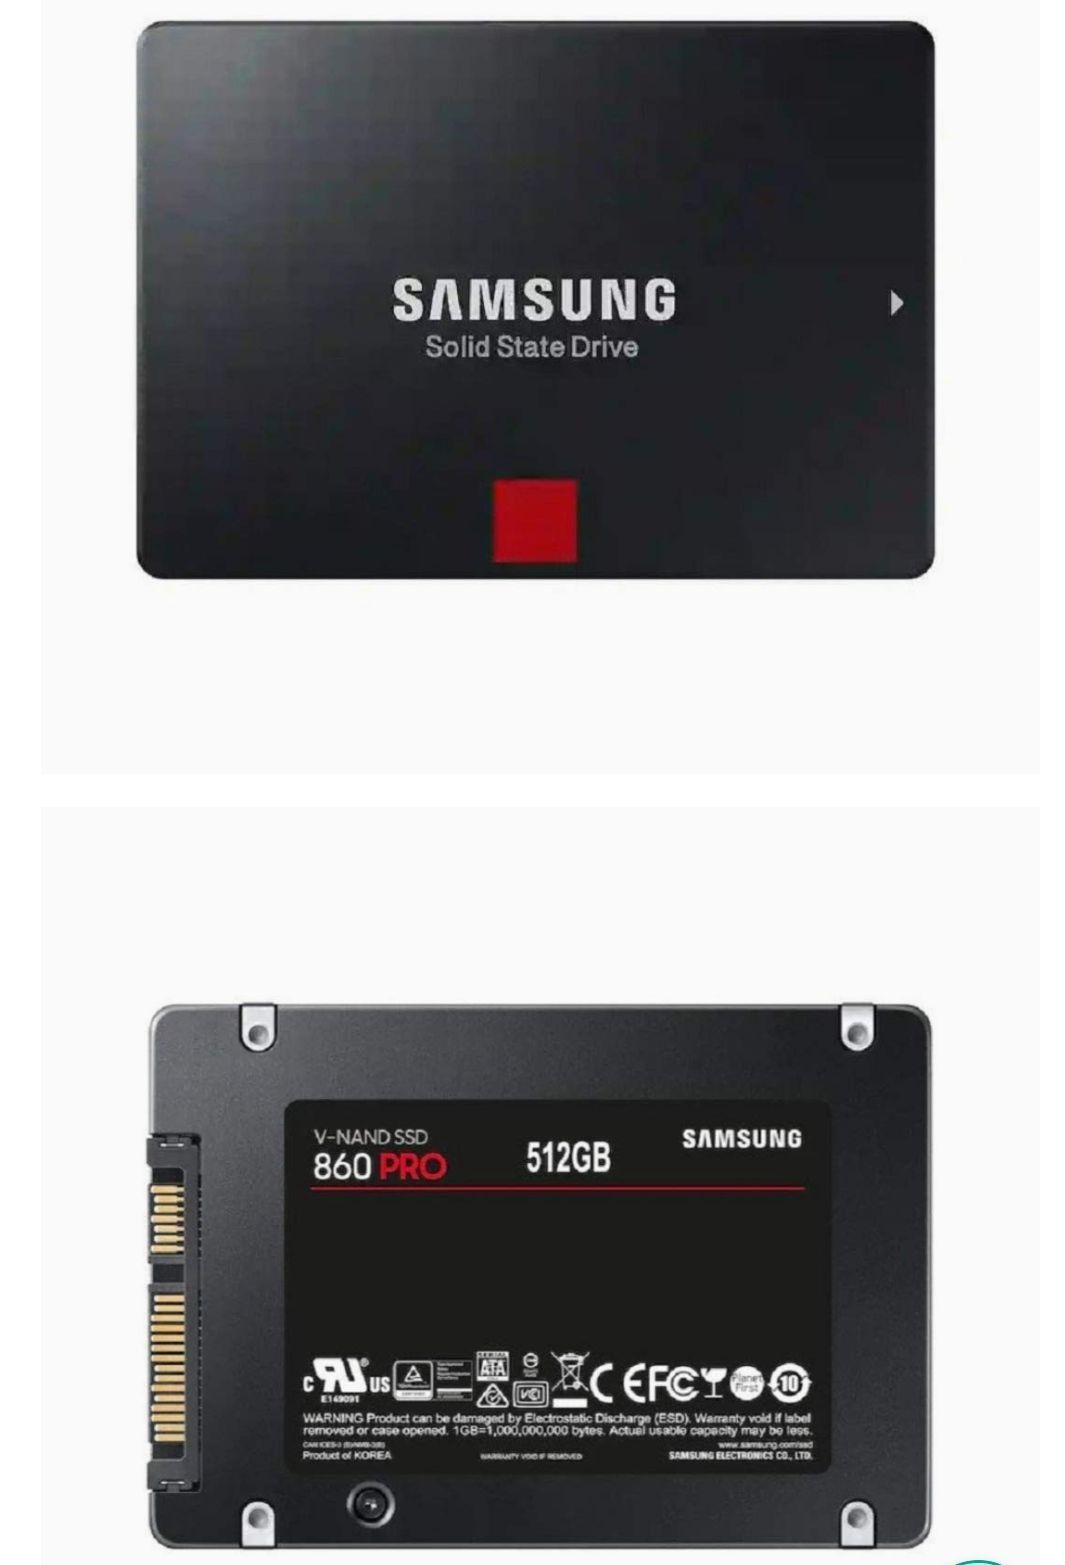 Amazon: Samsung SSD PRO 512 GB